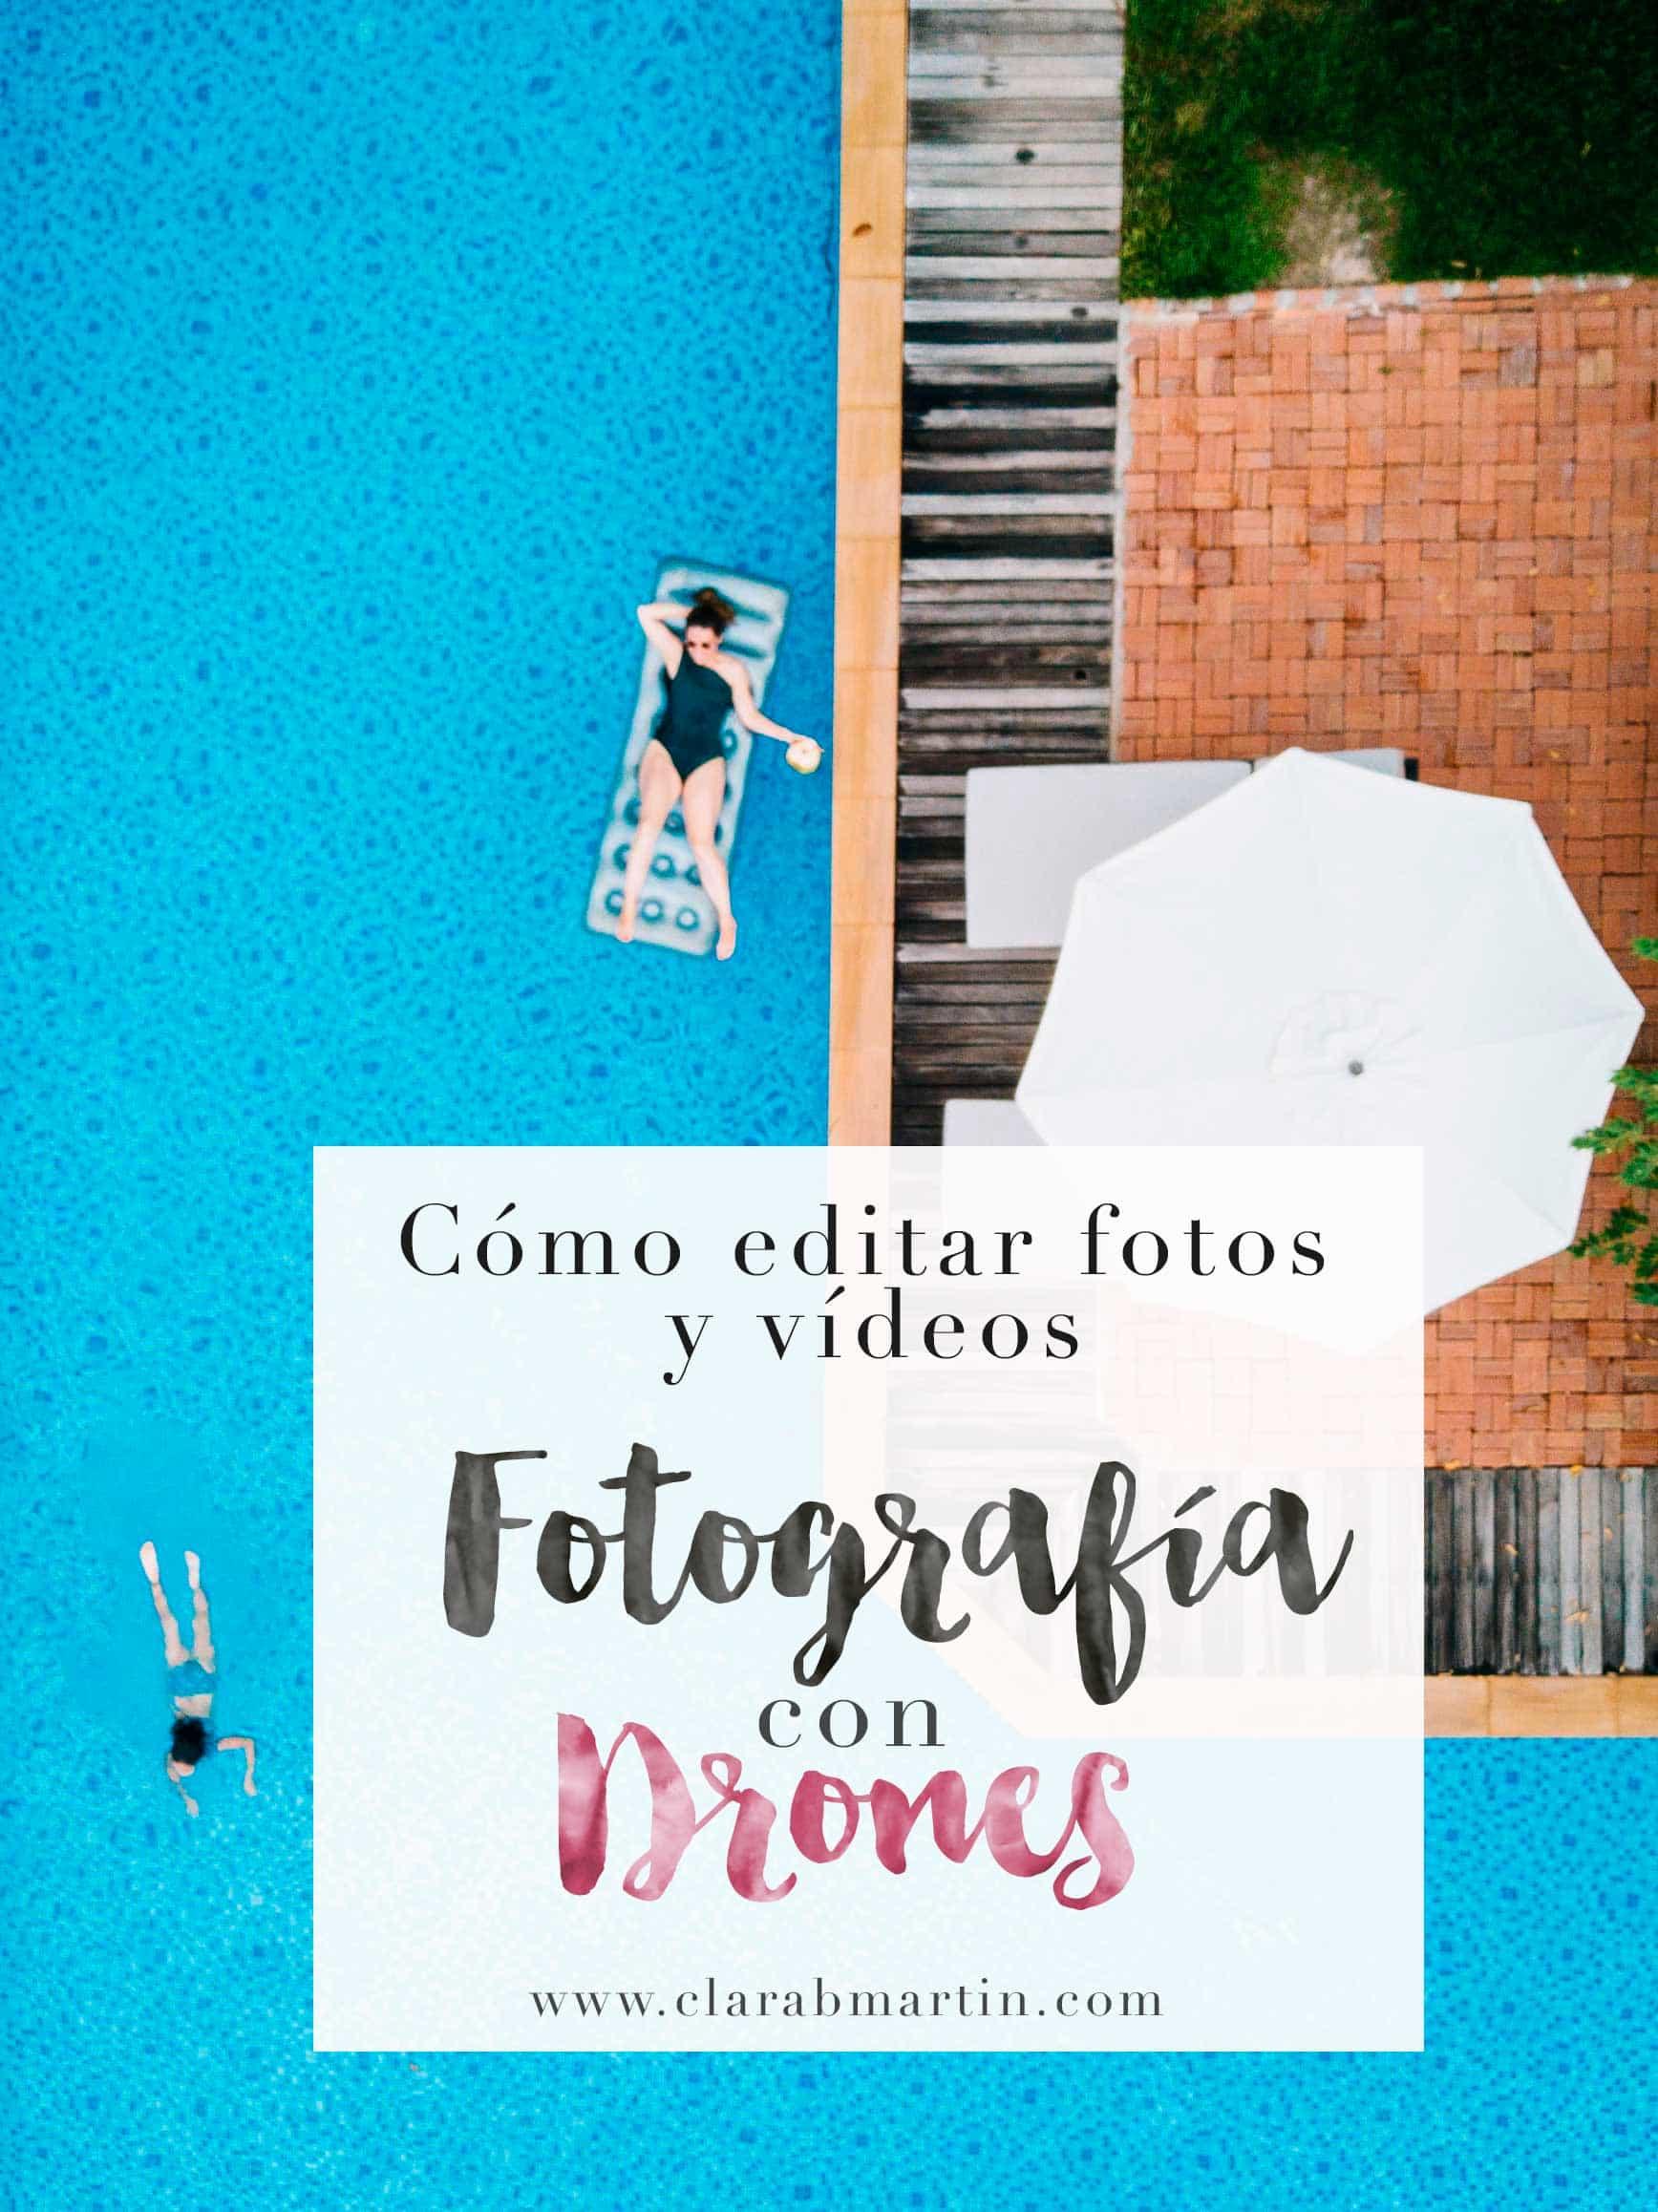 Edicion-fotos-dron